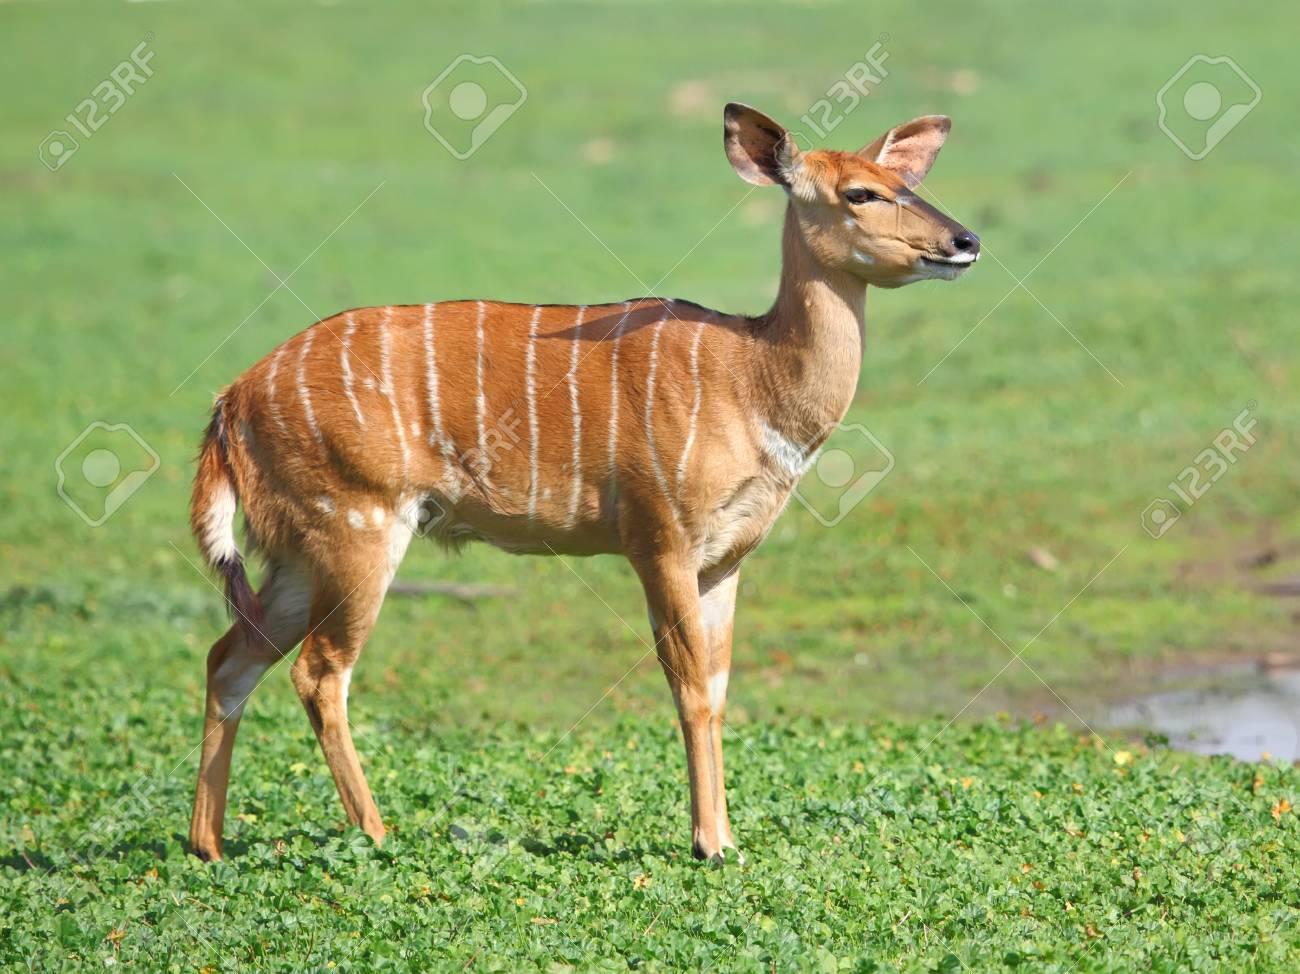 female antelope kudu on the grass Stock Photo - 18849366